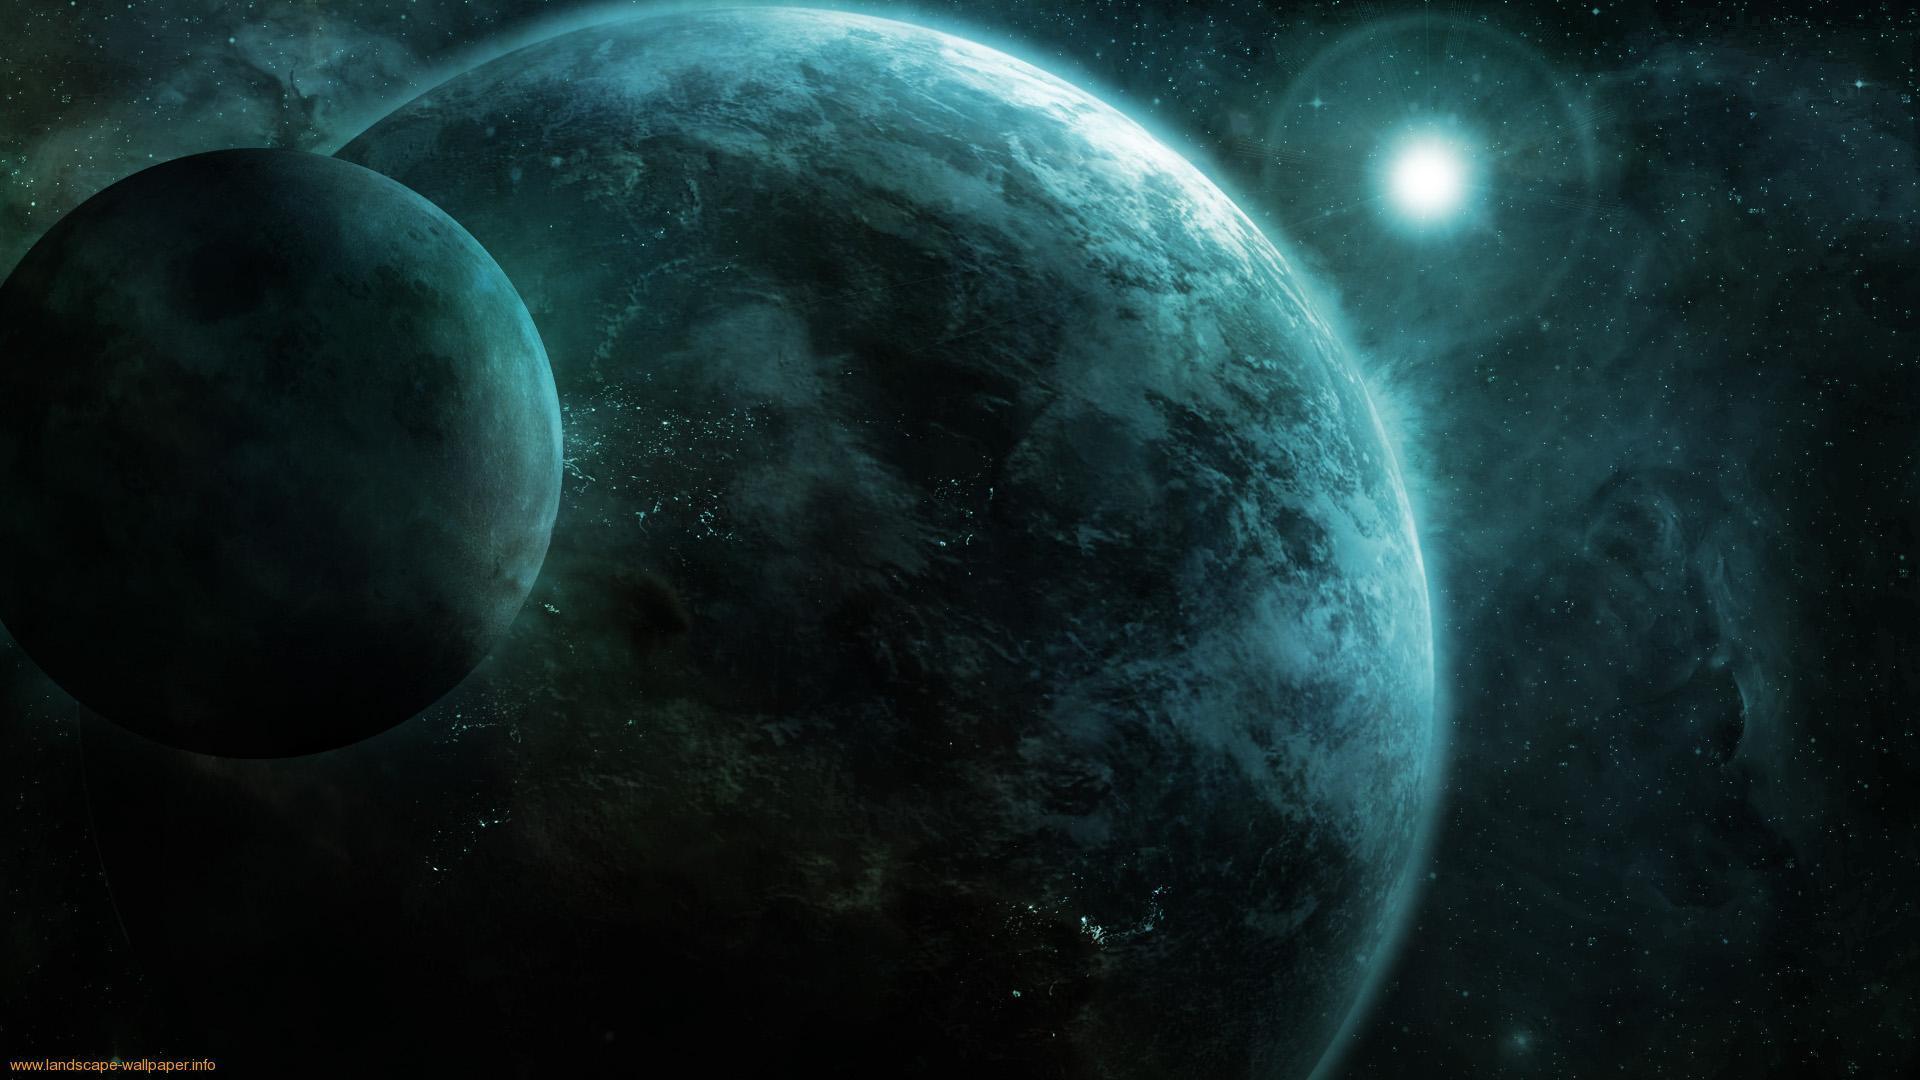 Dark Space Wallpaper: Dark Space Backgrounds